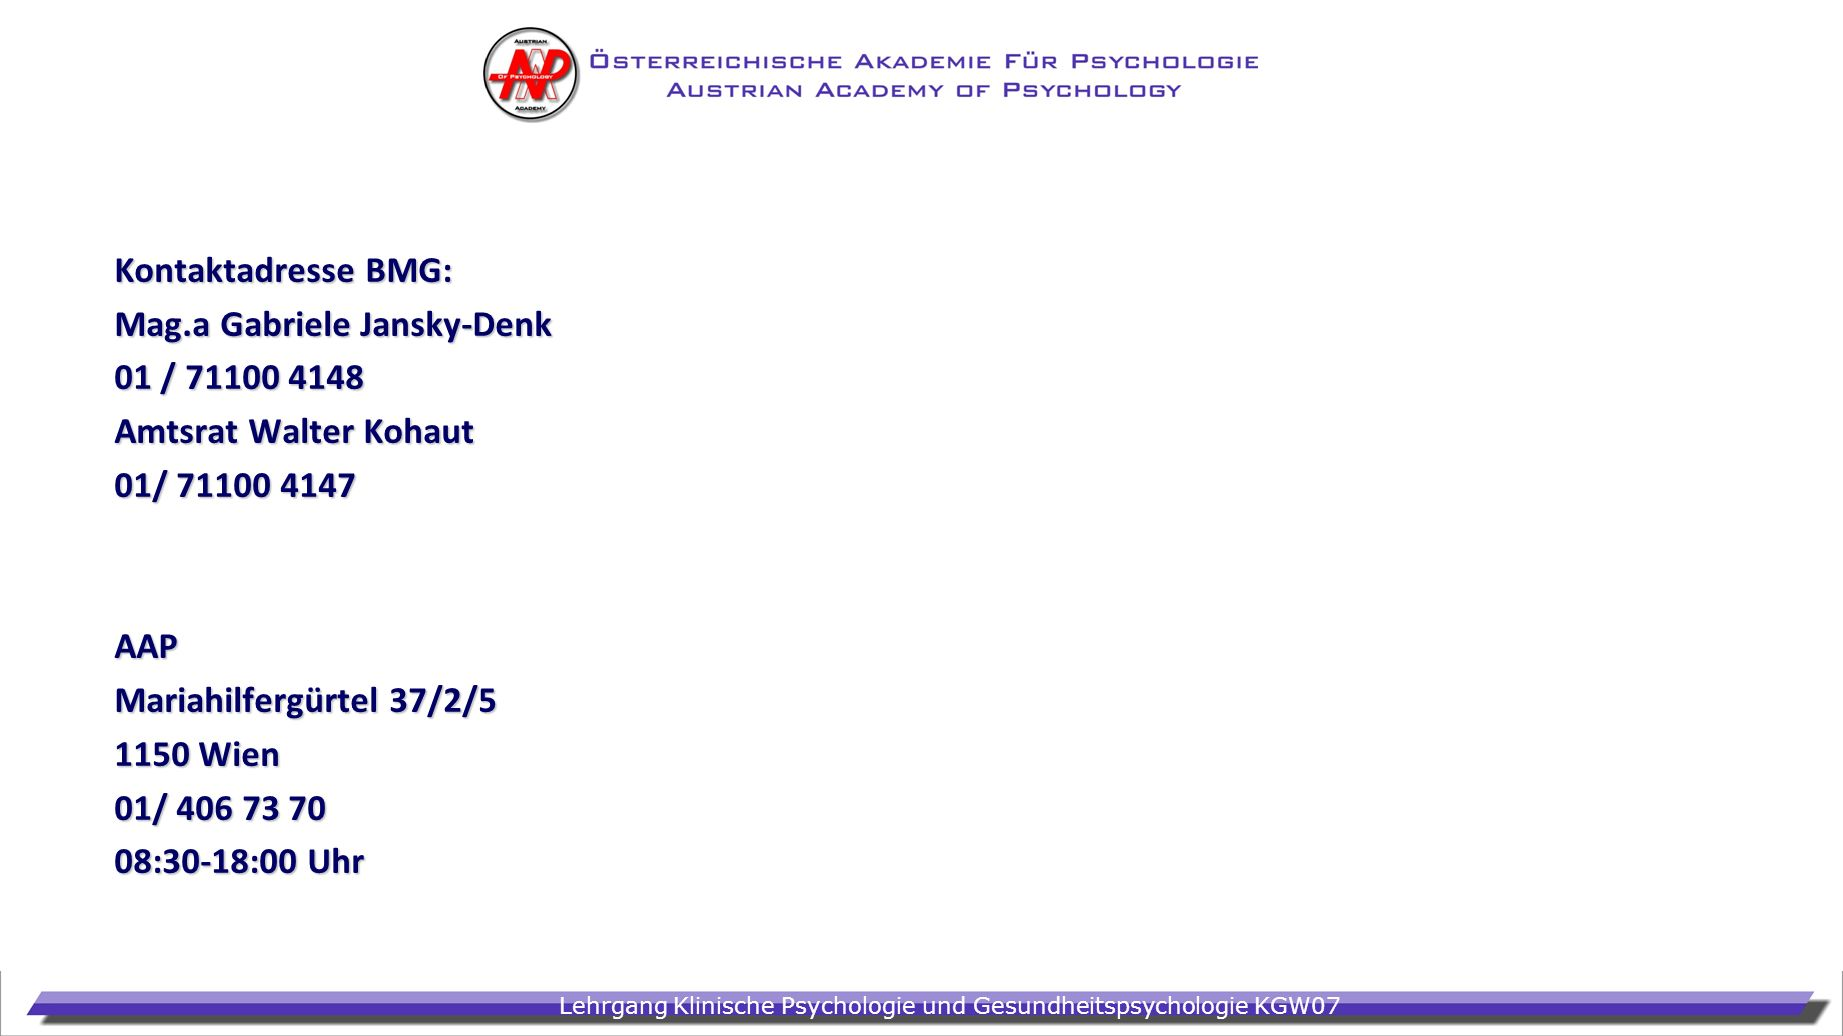 Kontaktadresse BMG: Mag.a Gabriele Jansky-Denk. 01 / 71100 4148. Amtsrat Walter Kohaut. 01/ 71100 4147.